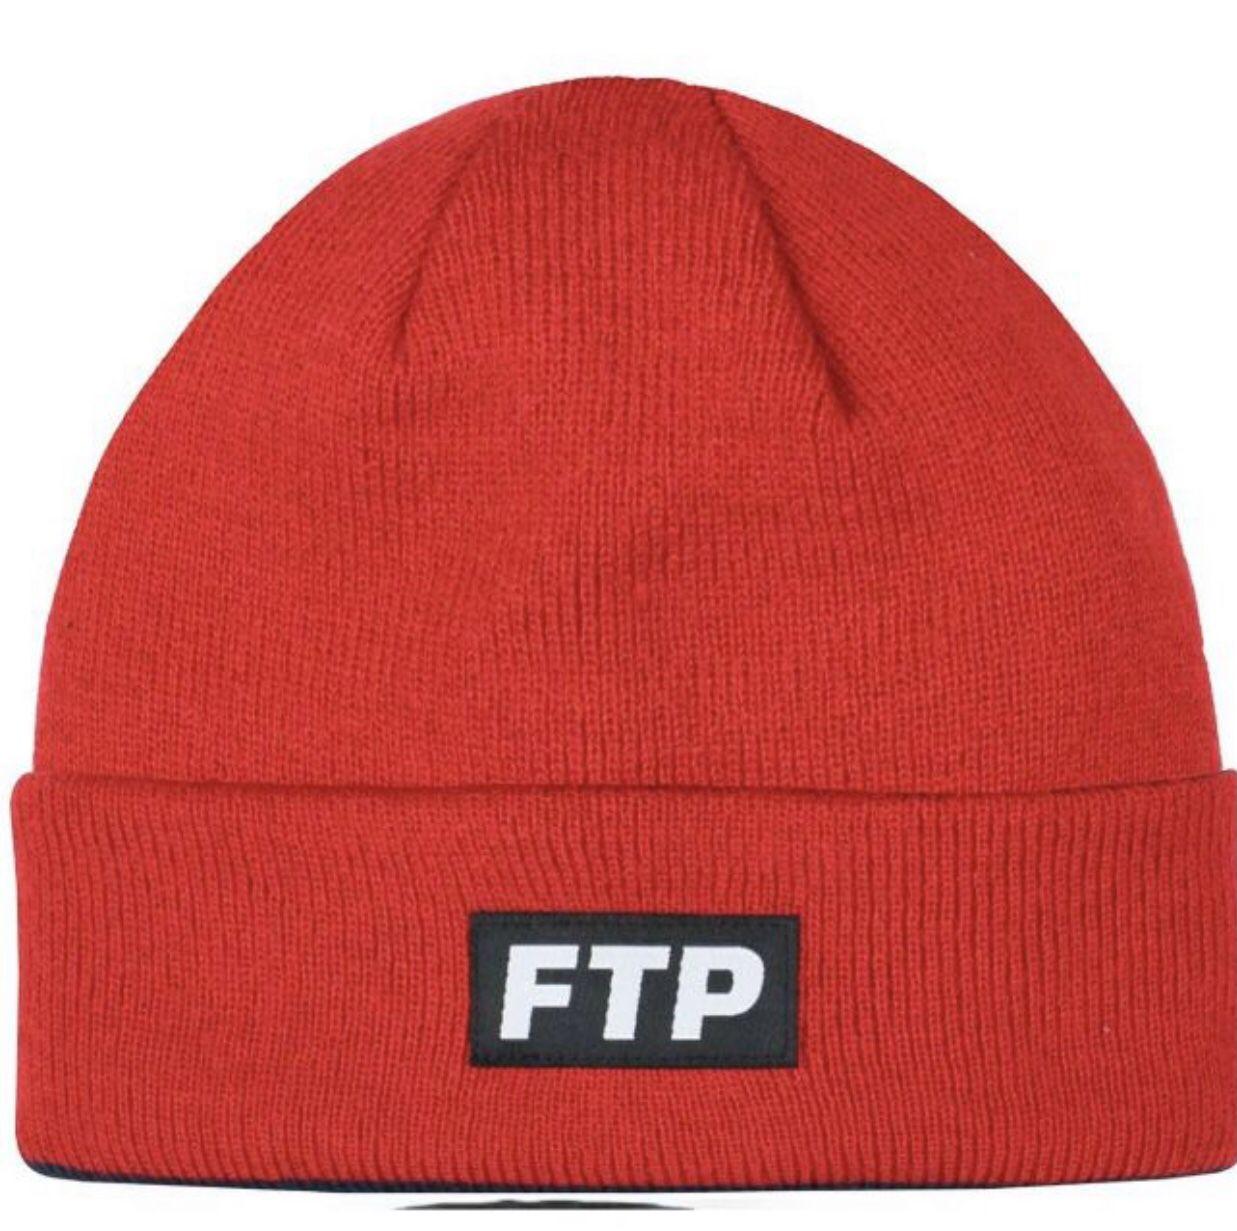 Ftp Reversible Beanie